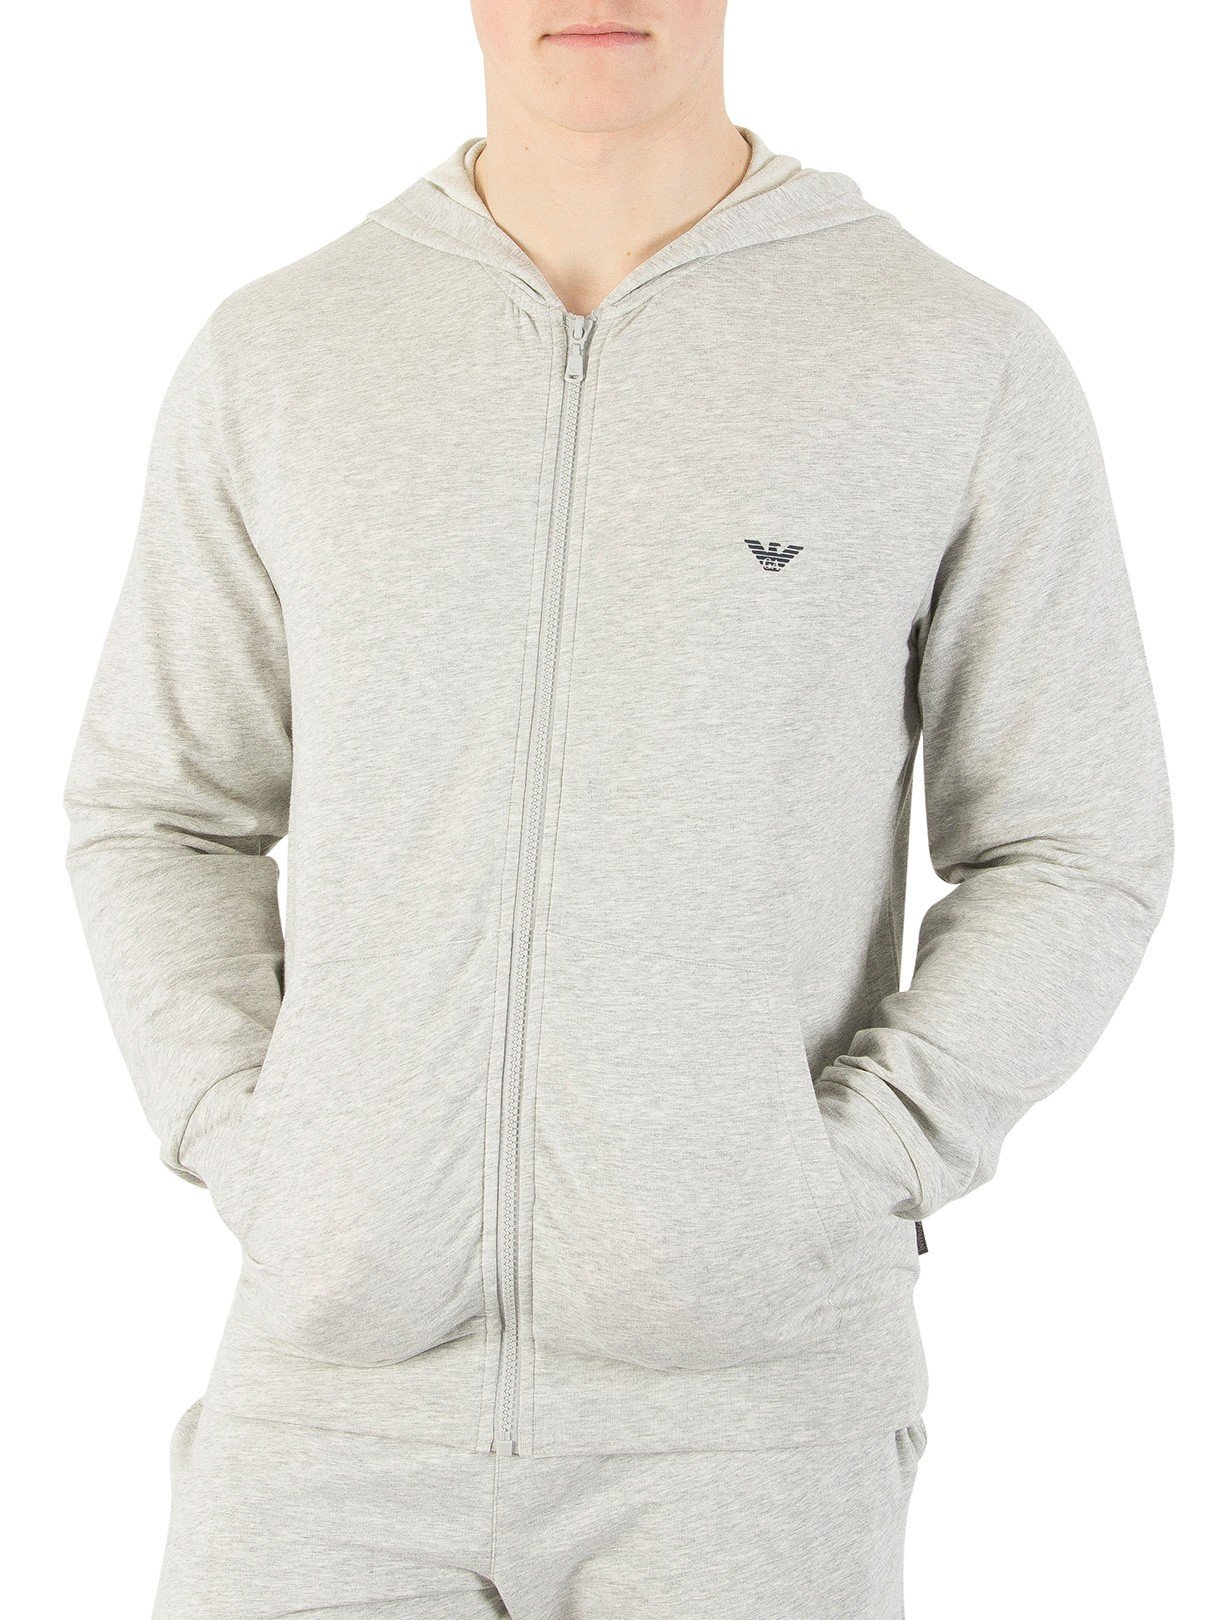 Emporio Armani Men's Zip Loungewear Top, Grey, Small